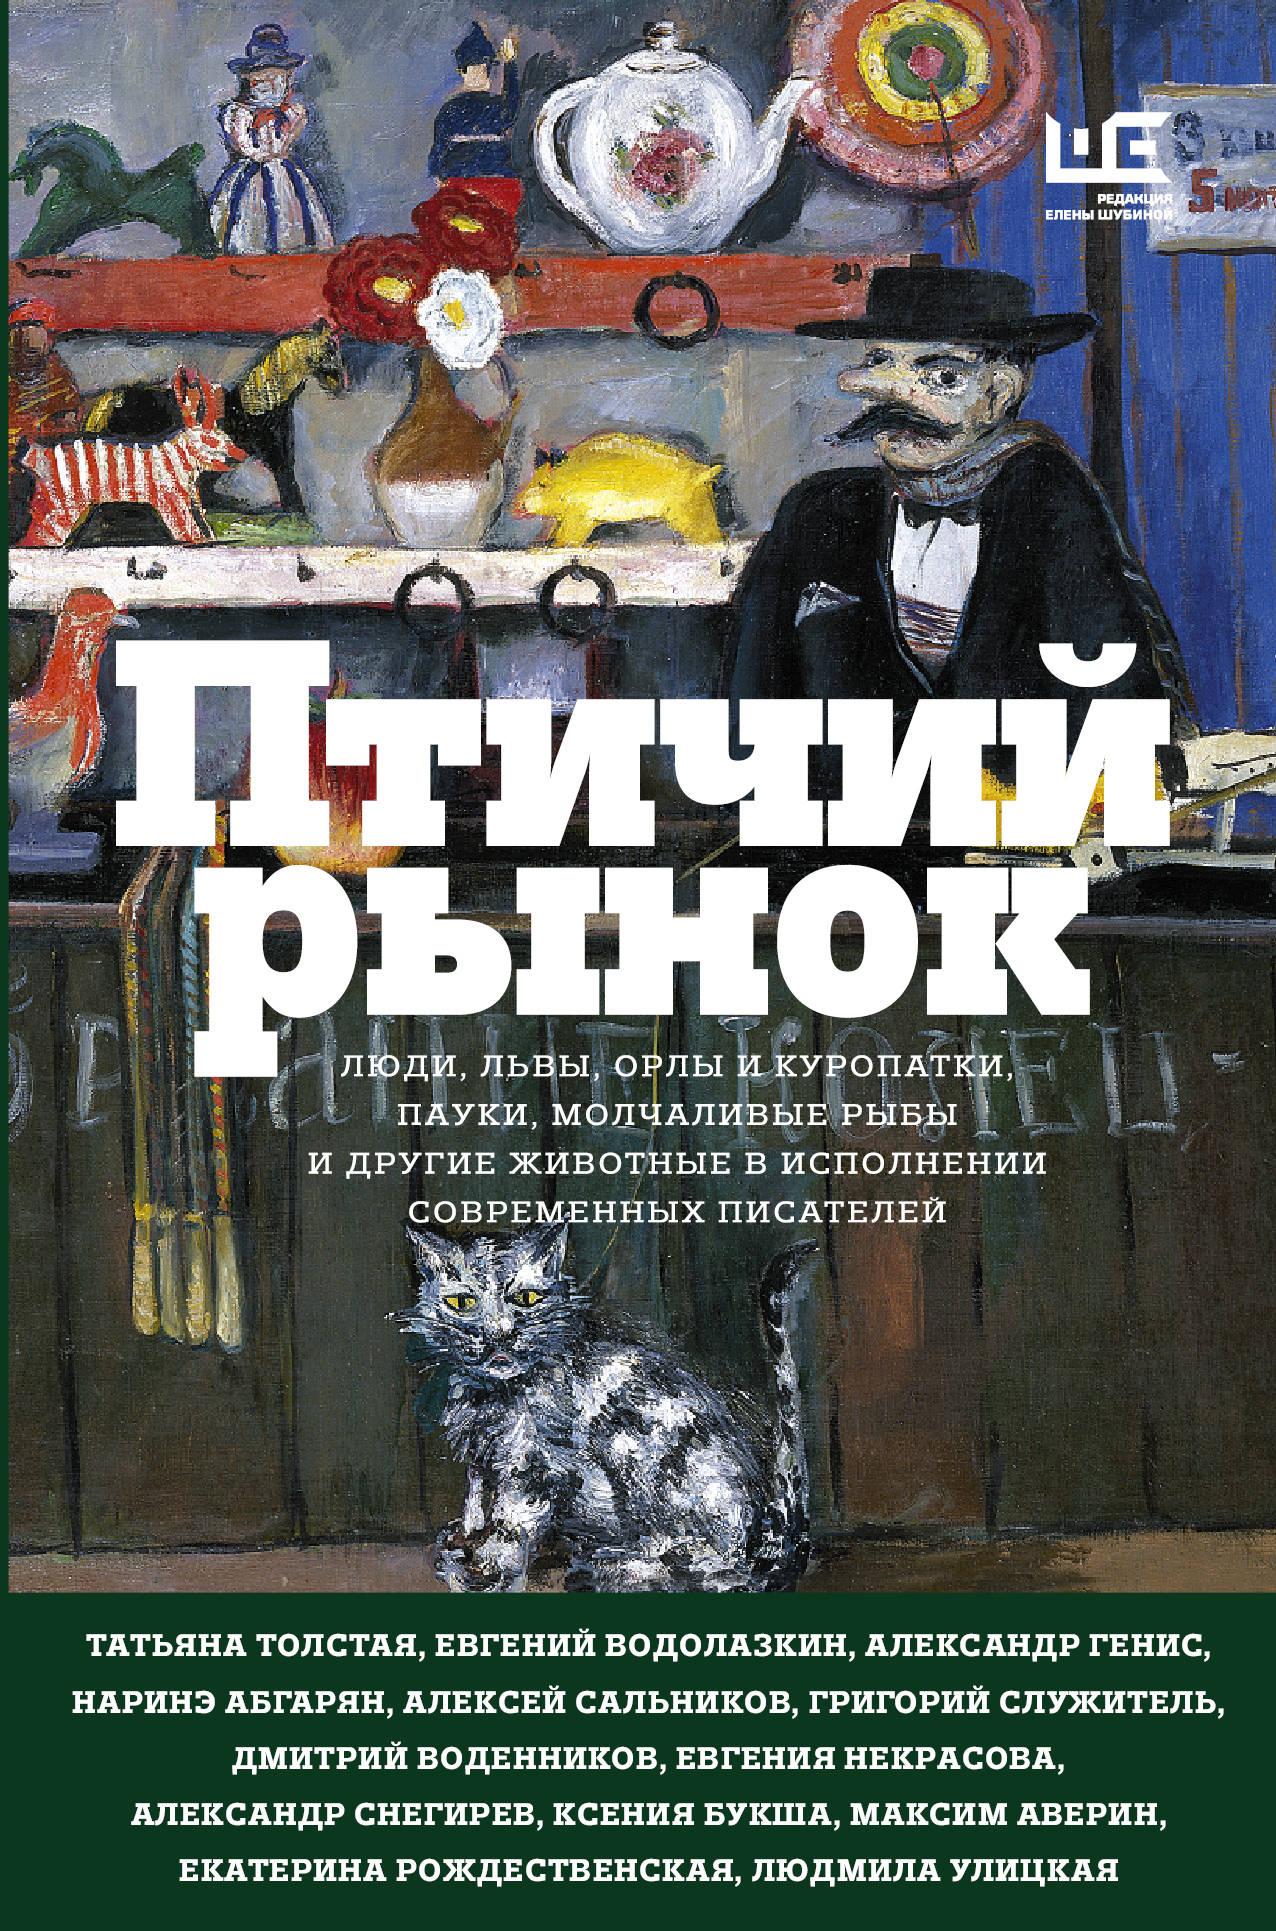 Наринэ Абгарян, Е. Г. Водолазкин, Т. Н. Толстая, Л. Е. Улицкая, Р. Сенчин Птичий рынок